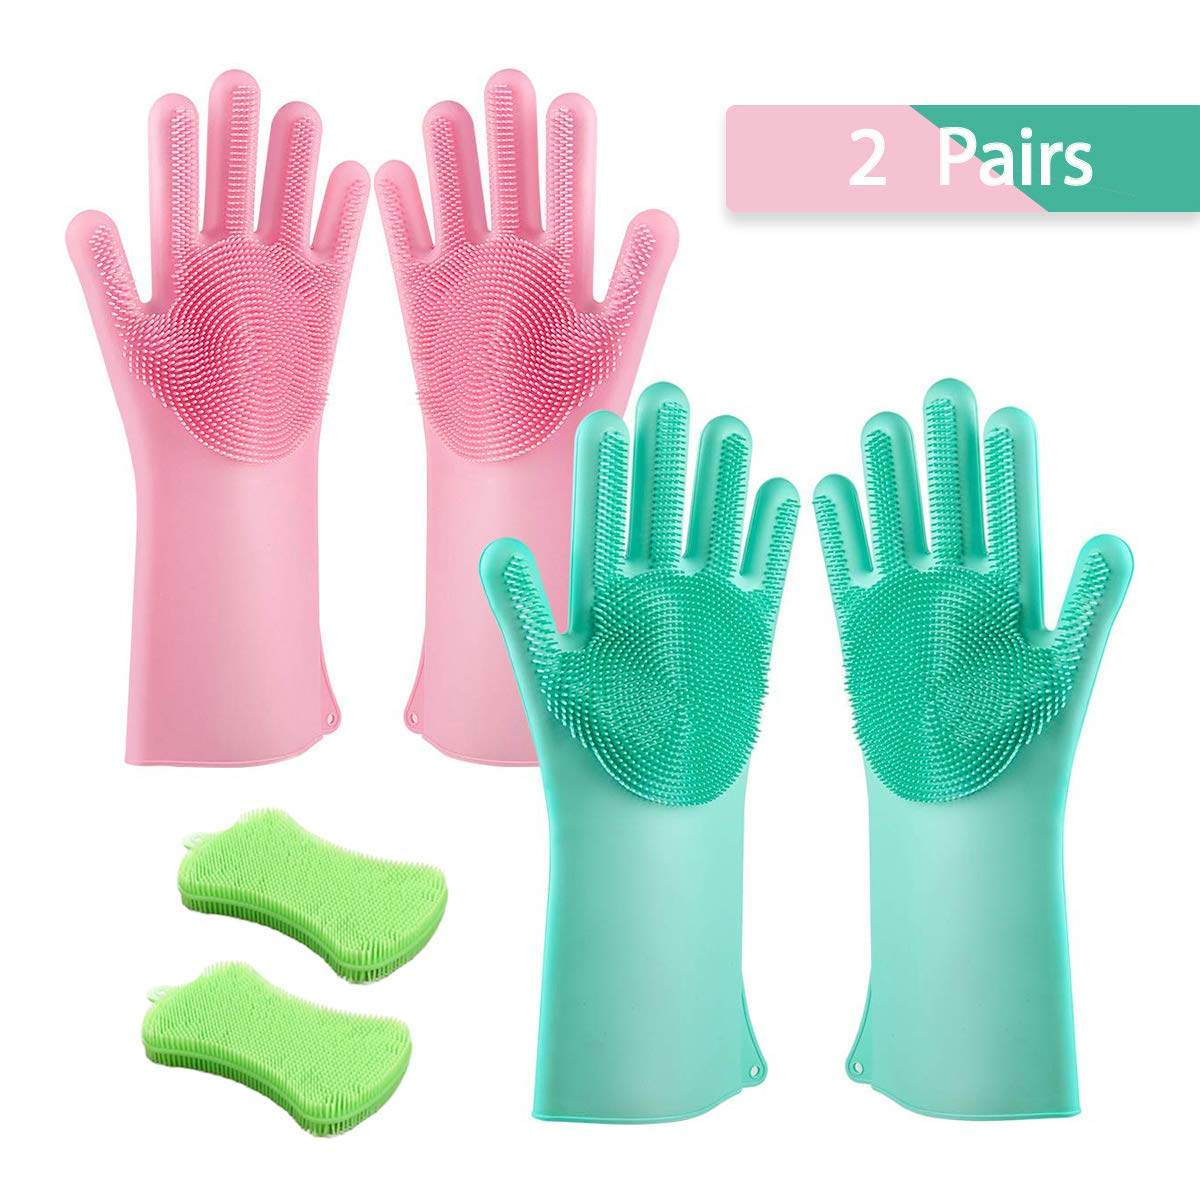 2 Pairs Magic Silicon Cleaning Scrubber Gloves Set with 2 Pack Sponge for Kitchen, Dishwashing, Car Washing, Pet Massage   Heat Resistant Brush Gloves Bundles